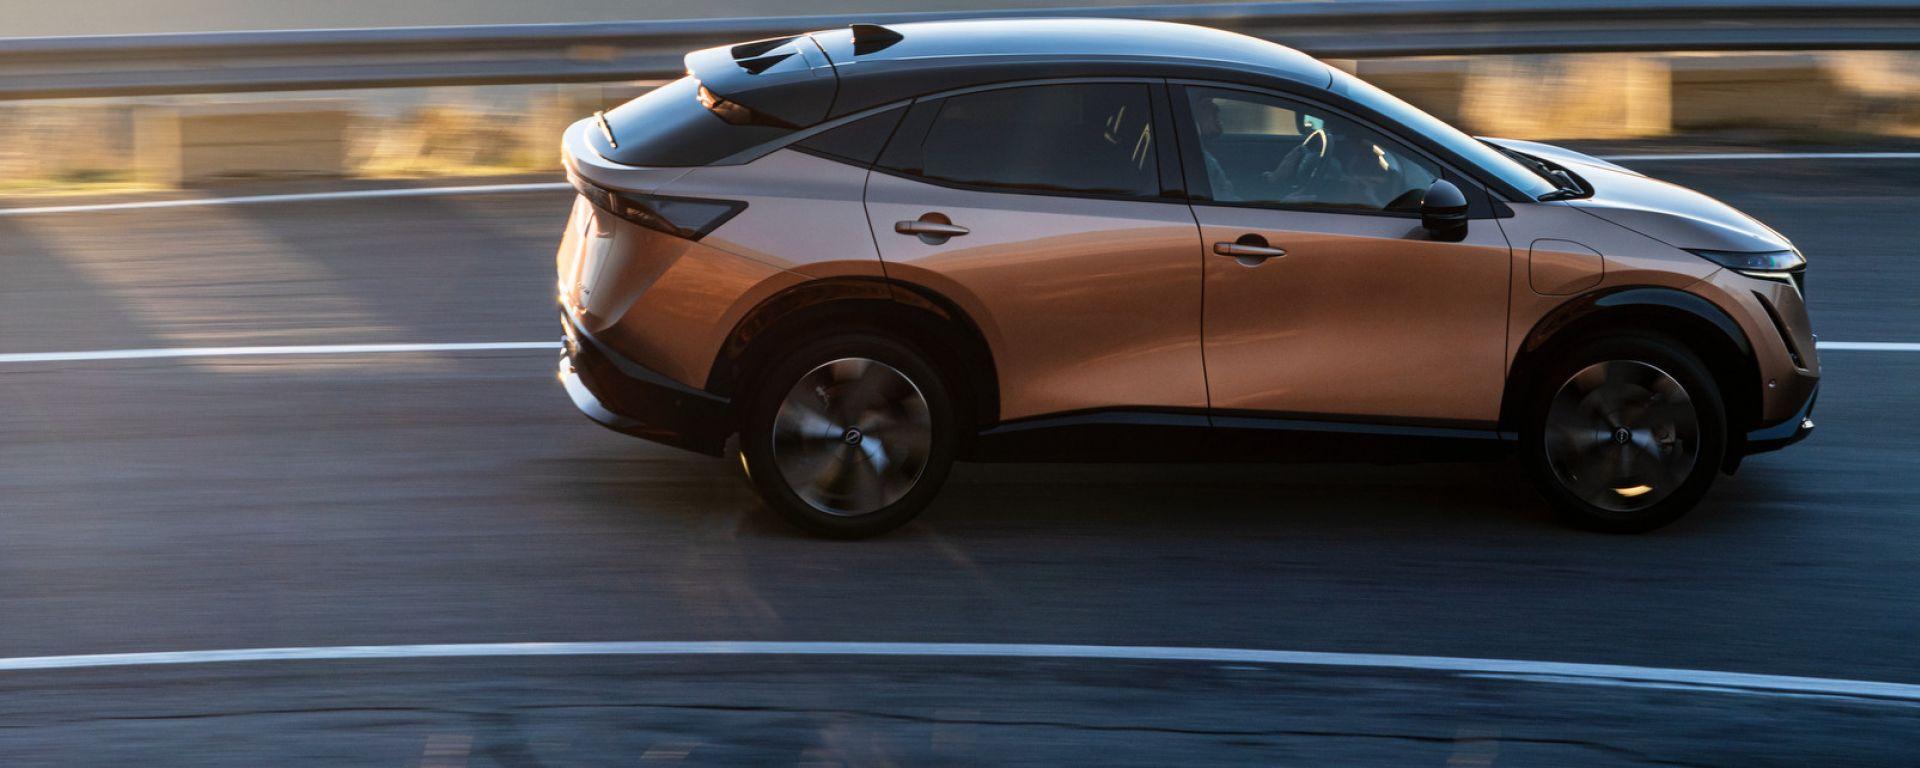 Nissan Ariya, il debutto è vicino